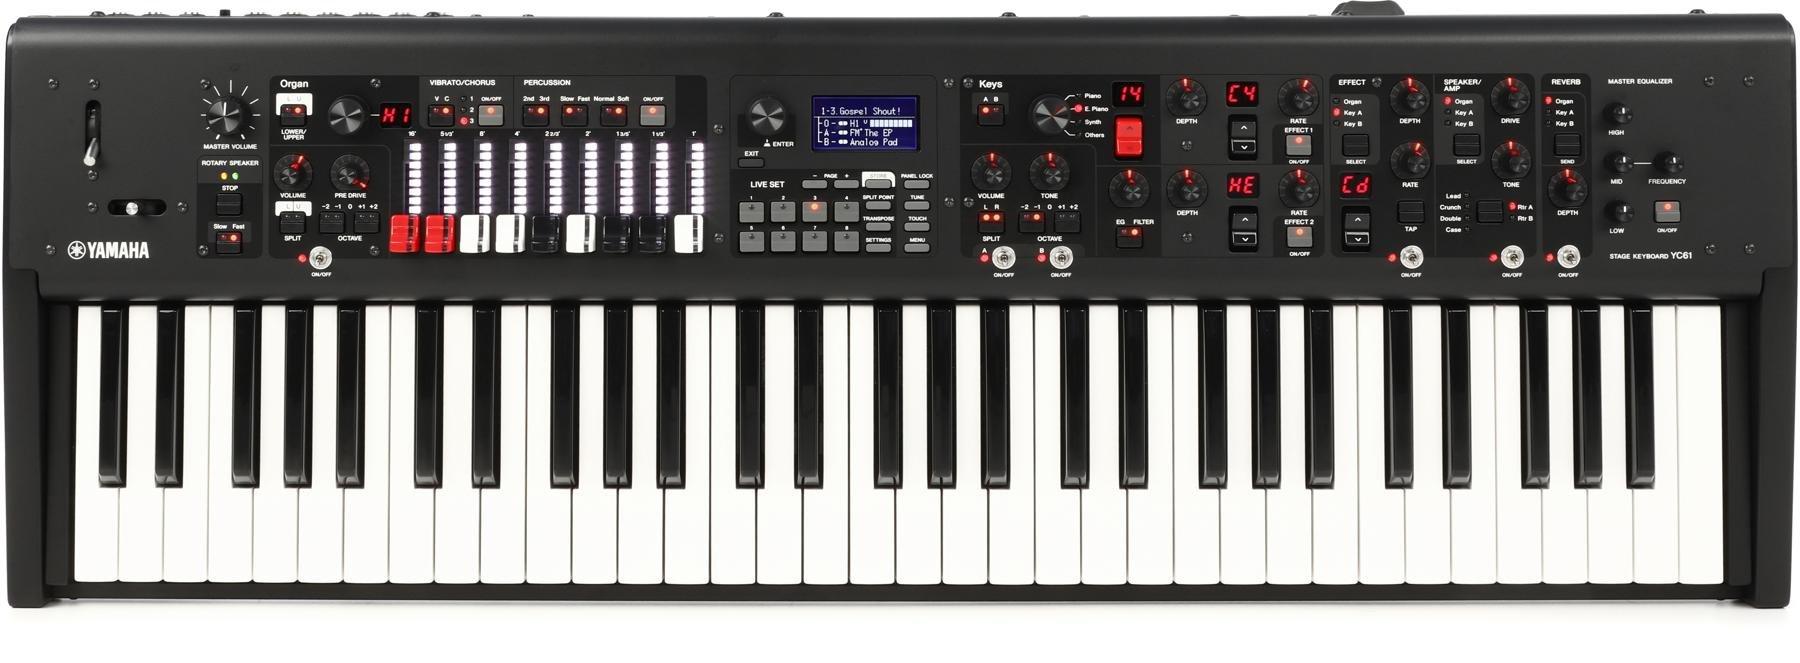 Yamaha YC61 Stage Piano